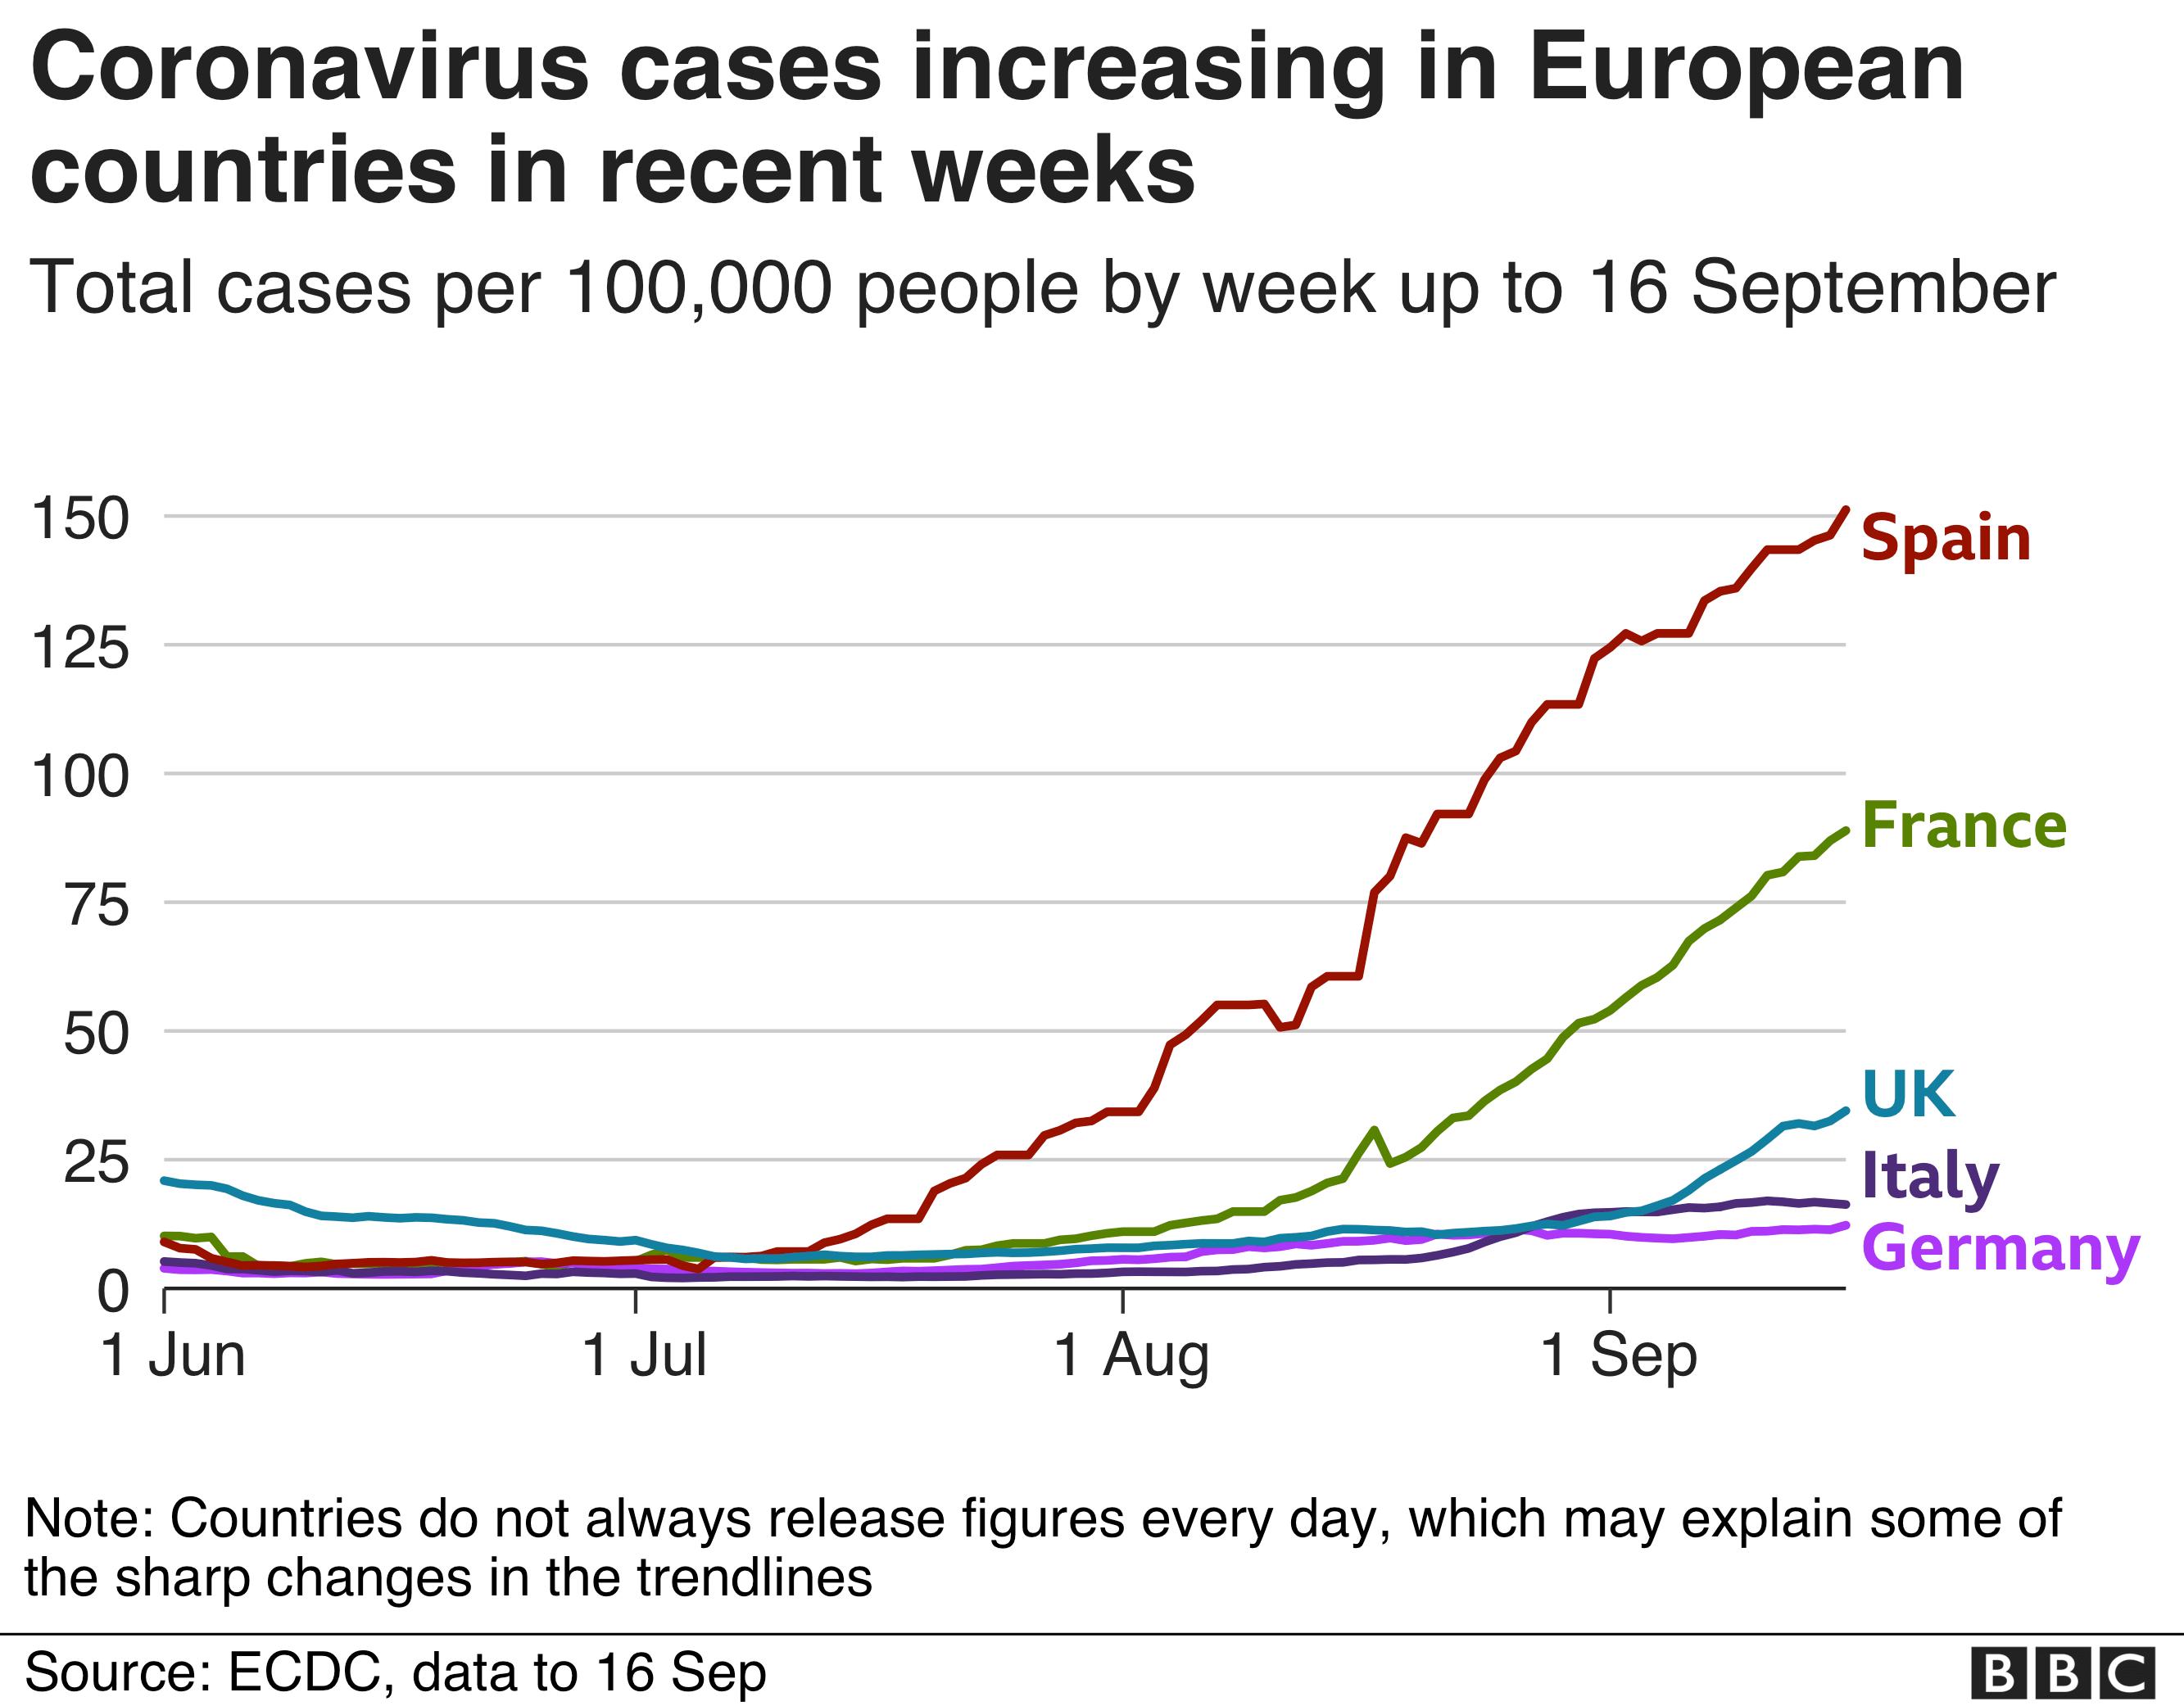 Chart showing coronavirus cases increasing in European countries in recent weeks